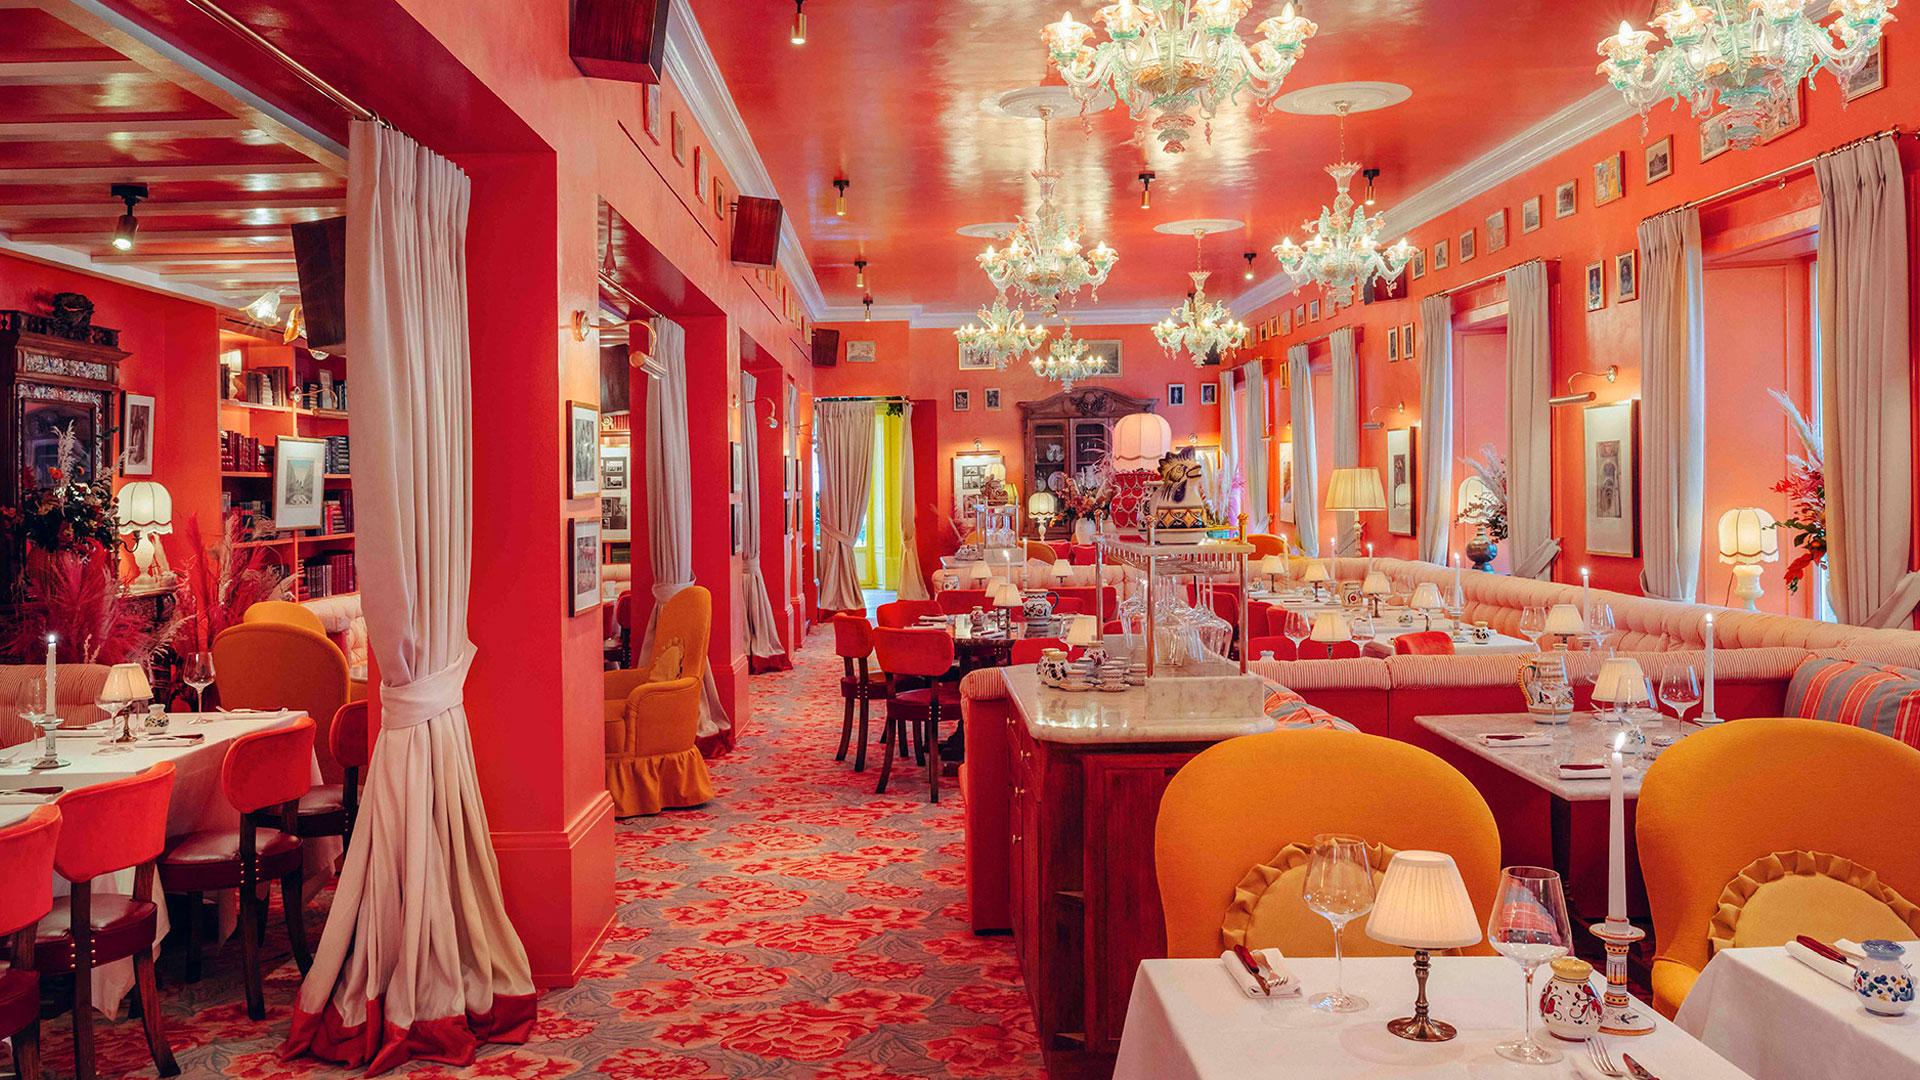 Imagen del restaurante Bel Mondo en Madrid